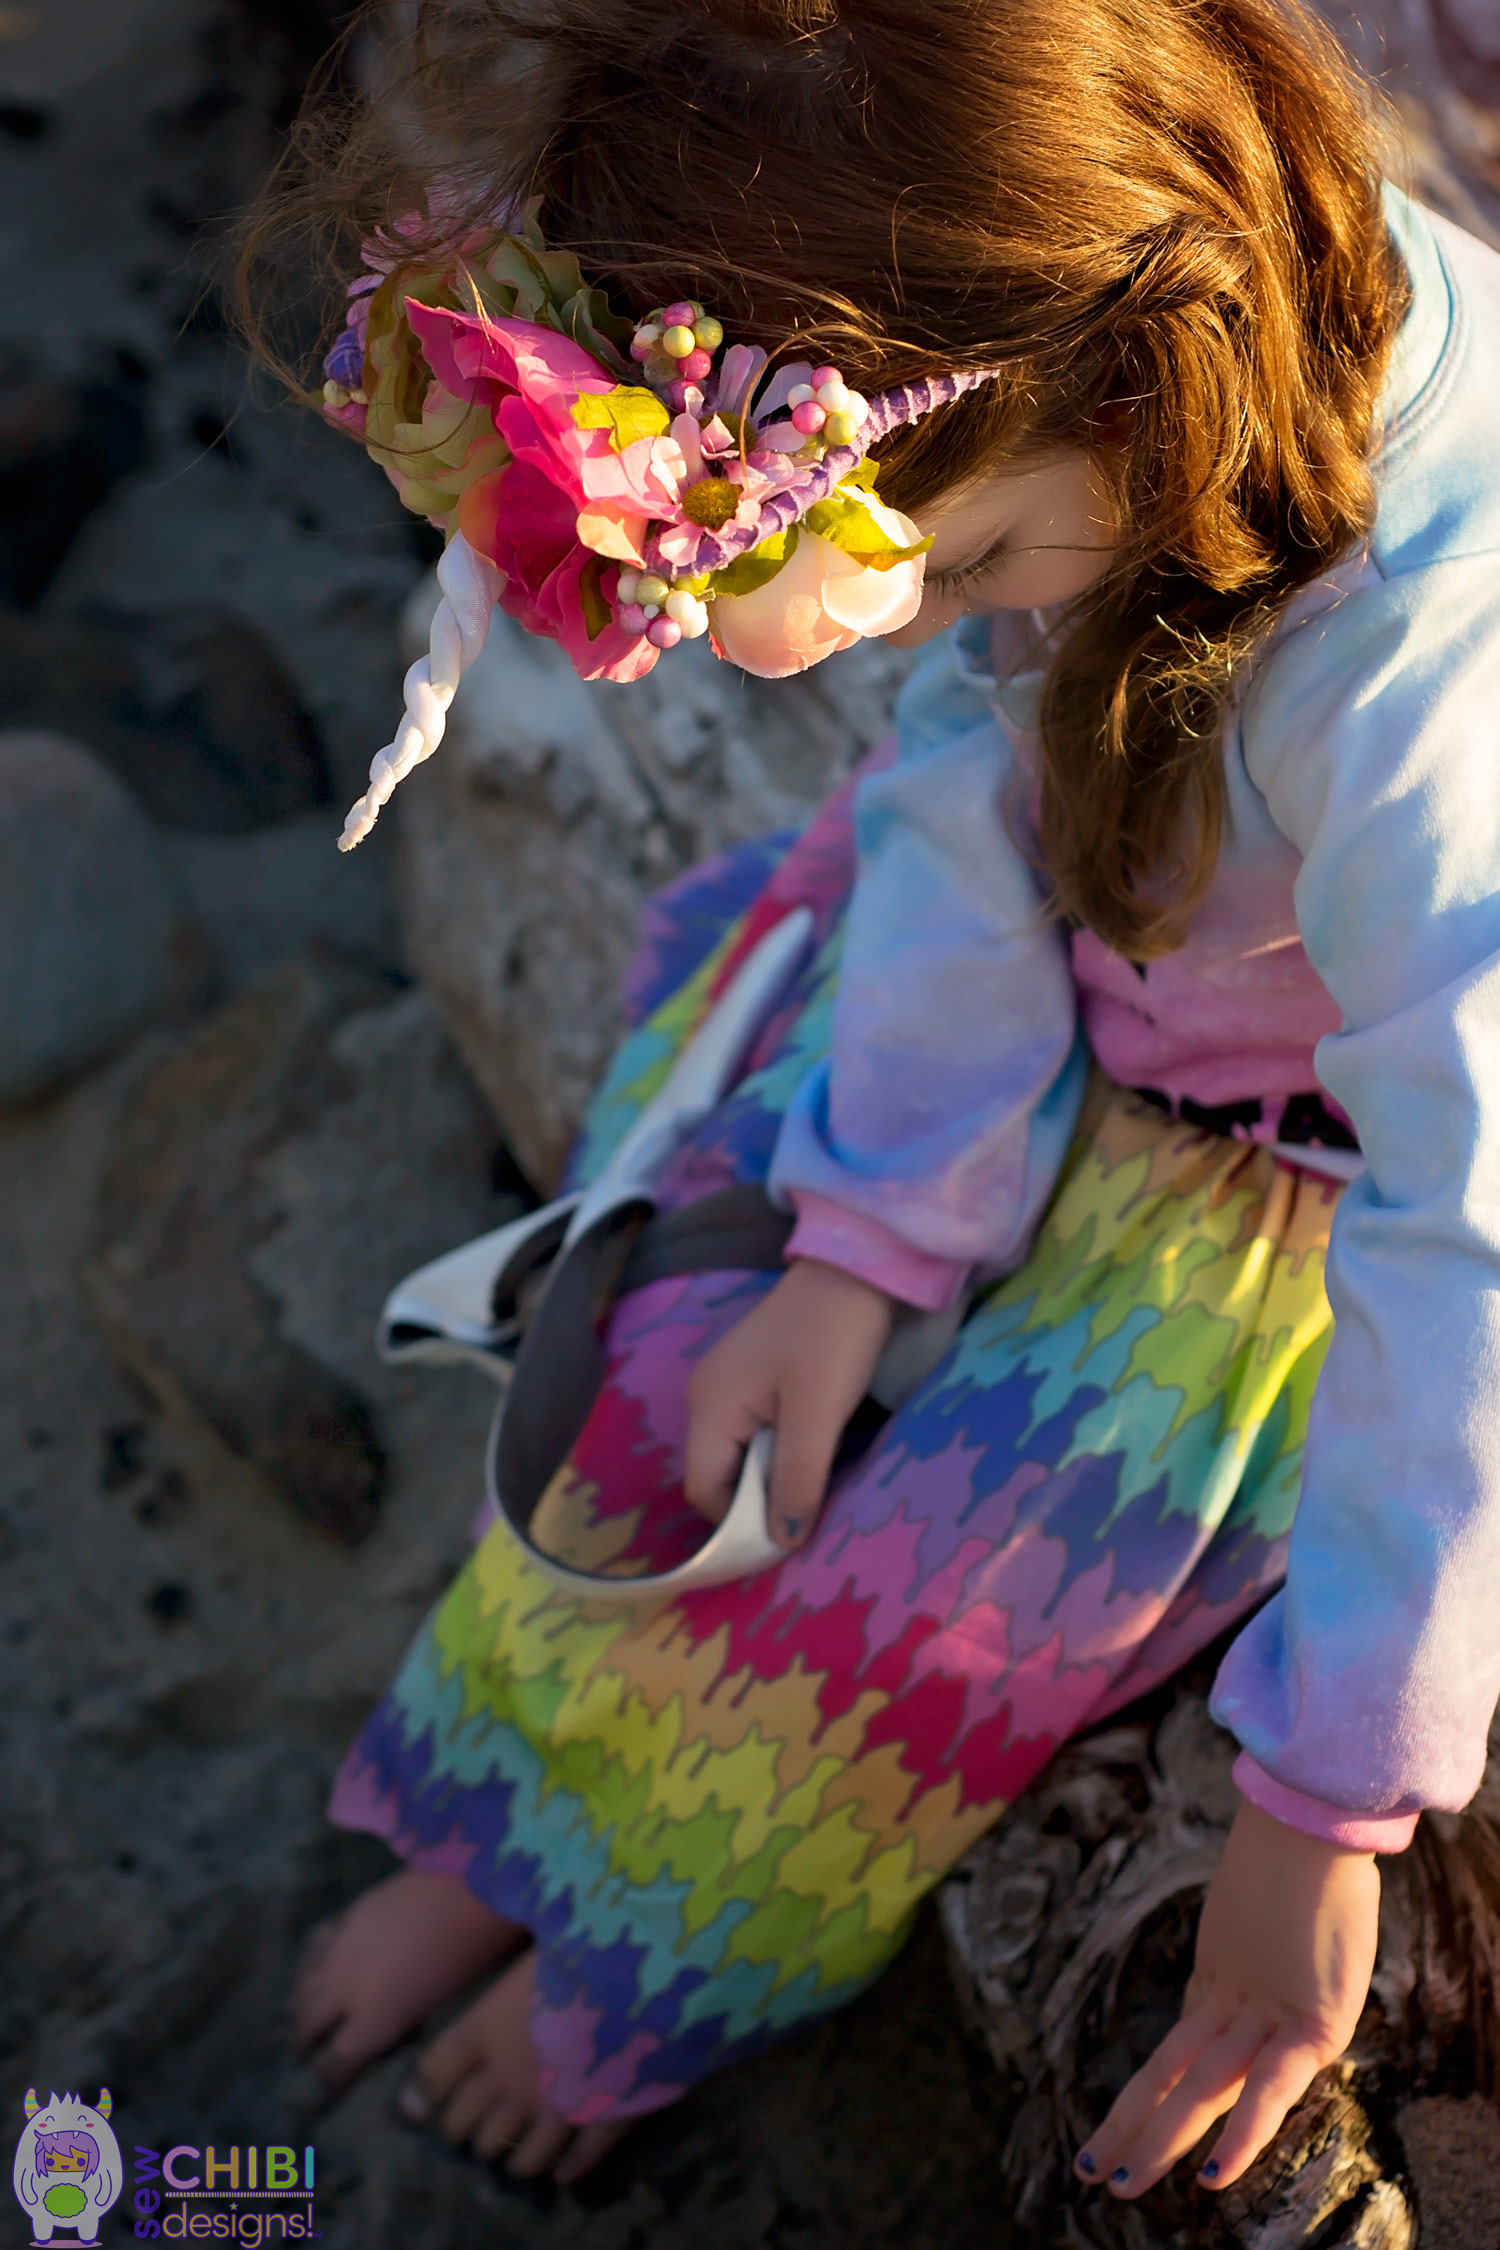 sephira-birthday-pastel-goth-and-bowie-19.jpg